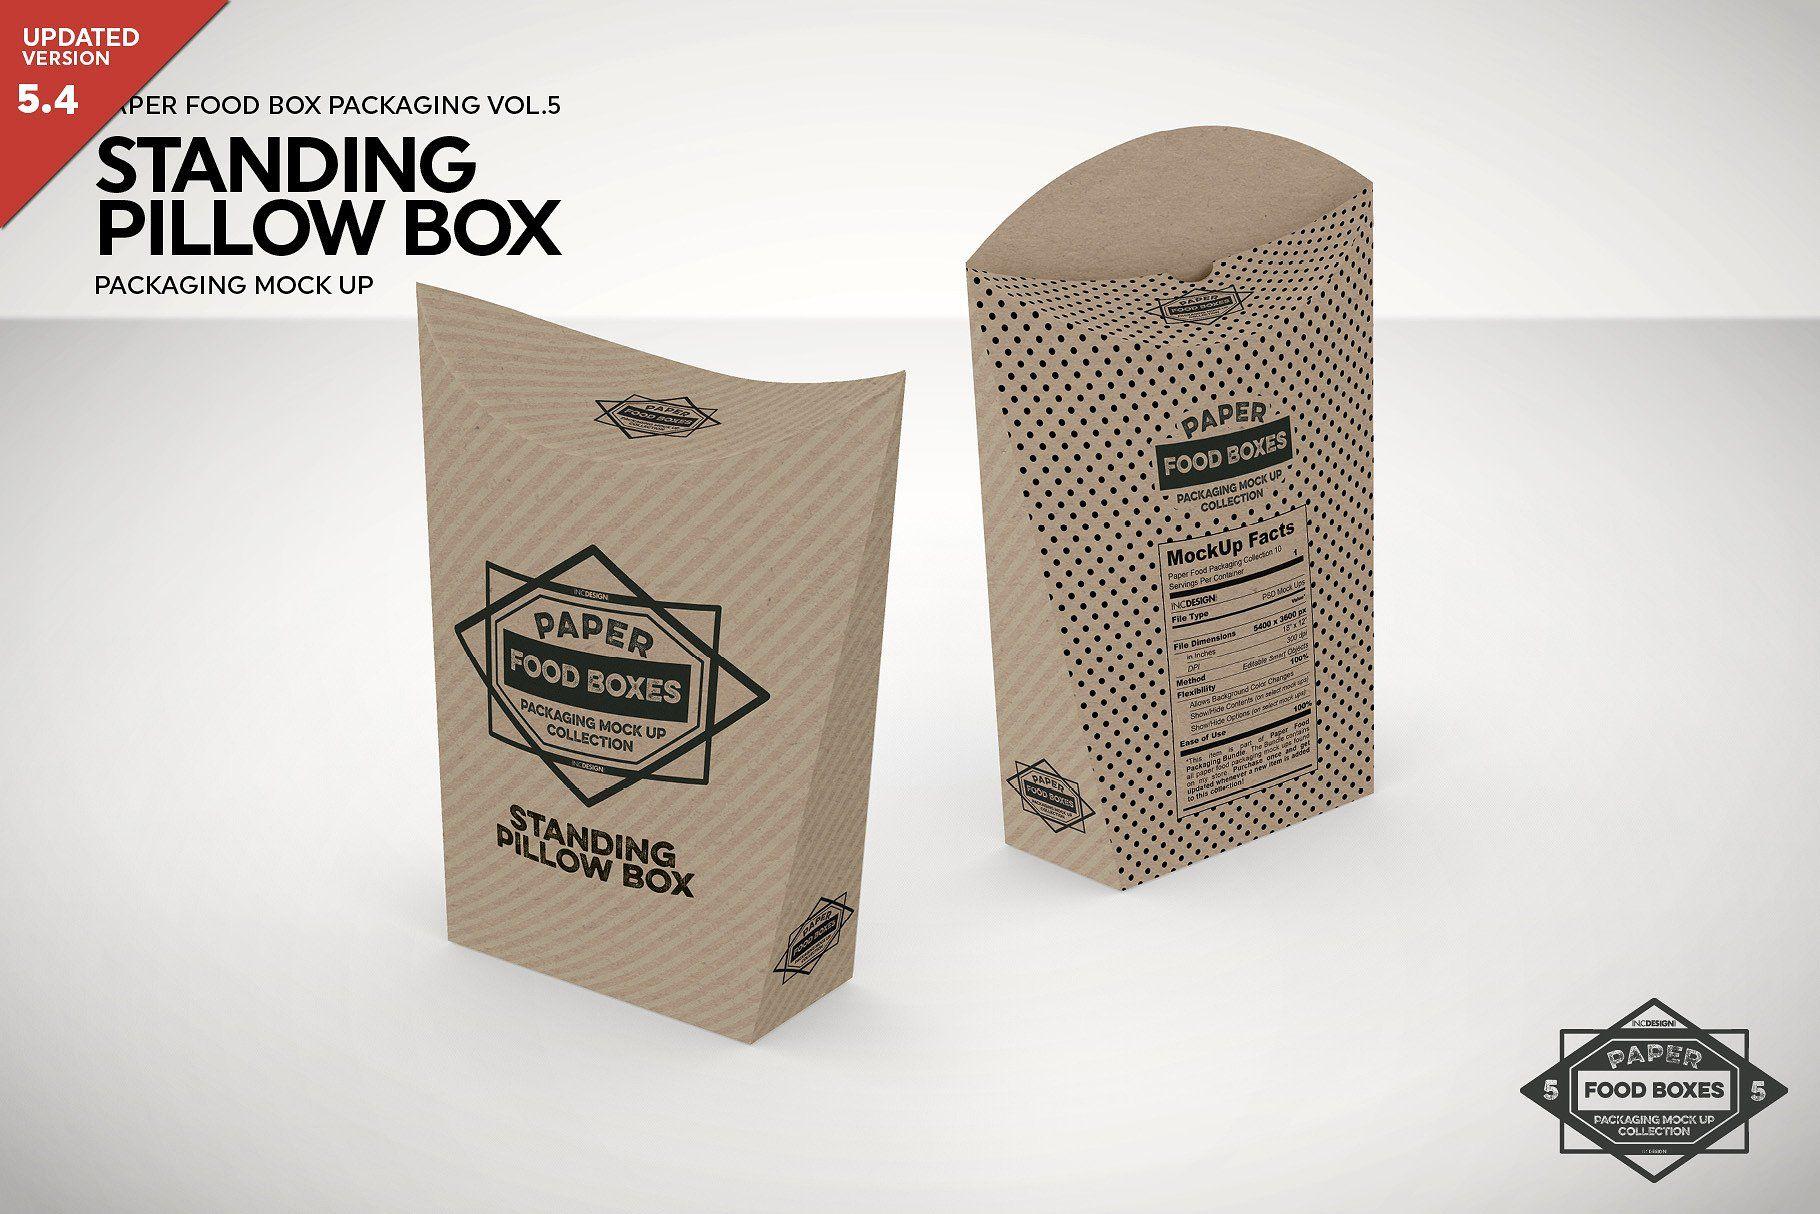 Standing Pillow Box Packaging Mockup Packaging Mockup Pillow Box Free Packaging Mockup